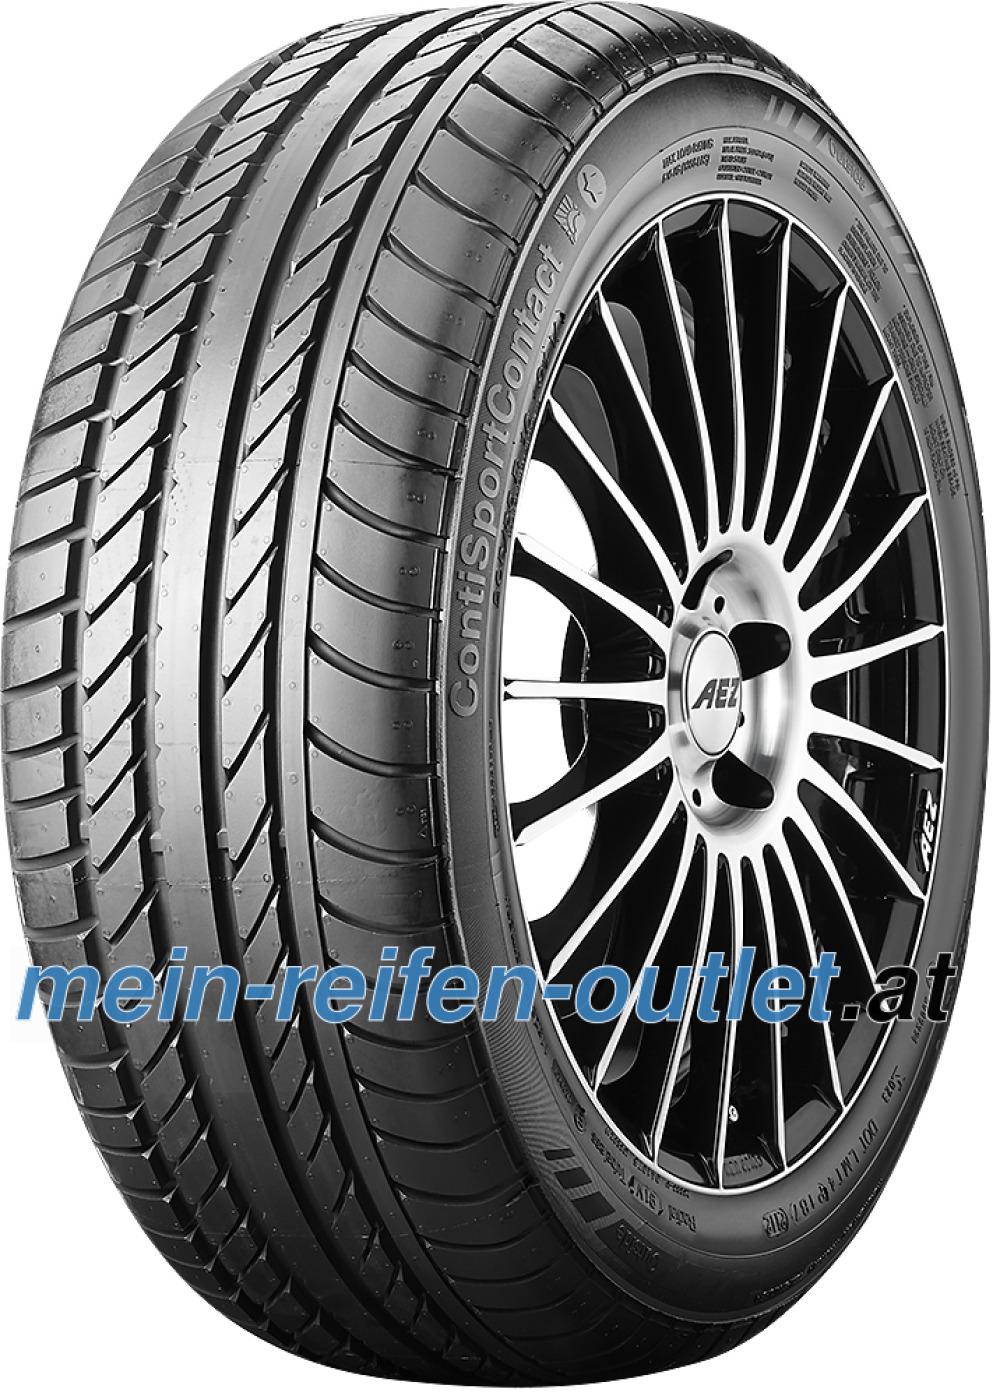 Continental SportContact ( 225/45 ZR18 ZR mit Felgenrippe, M3 )